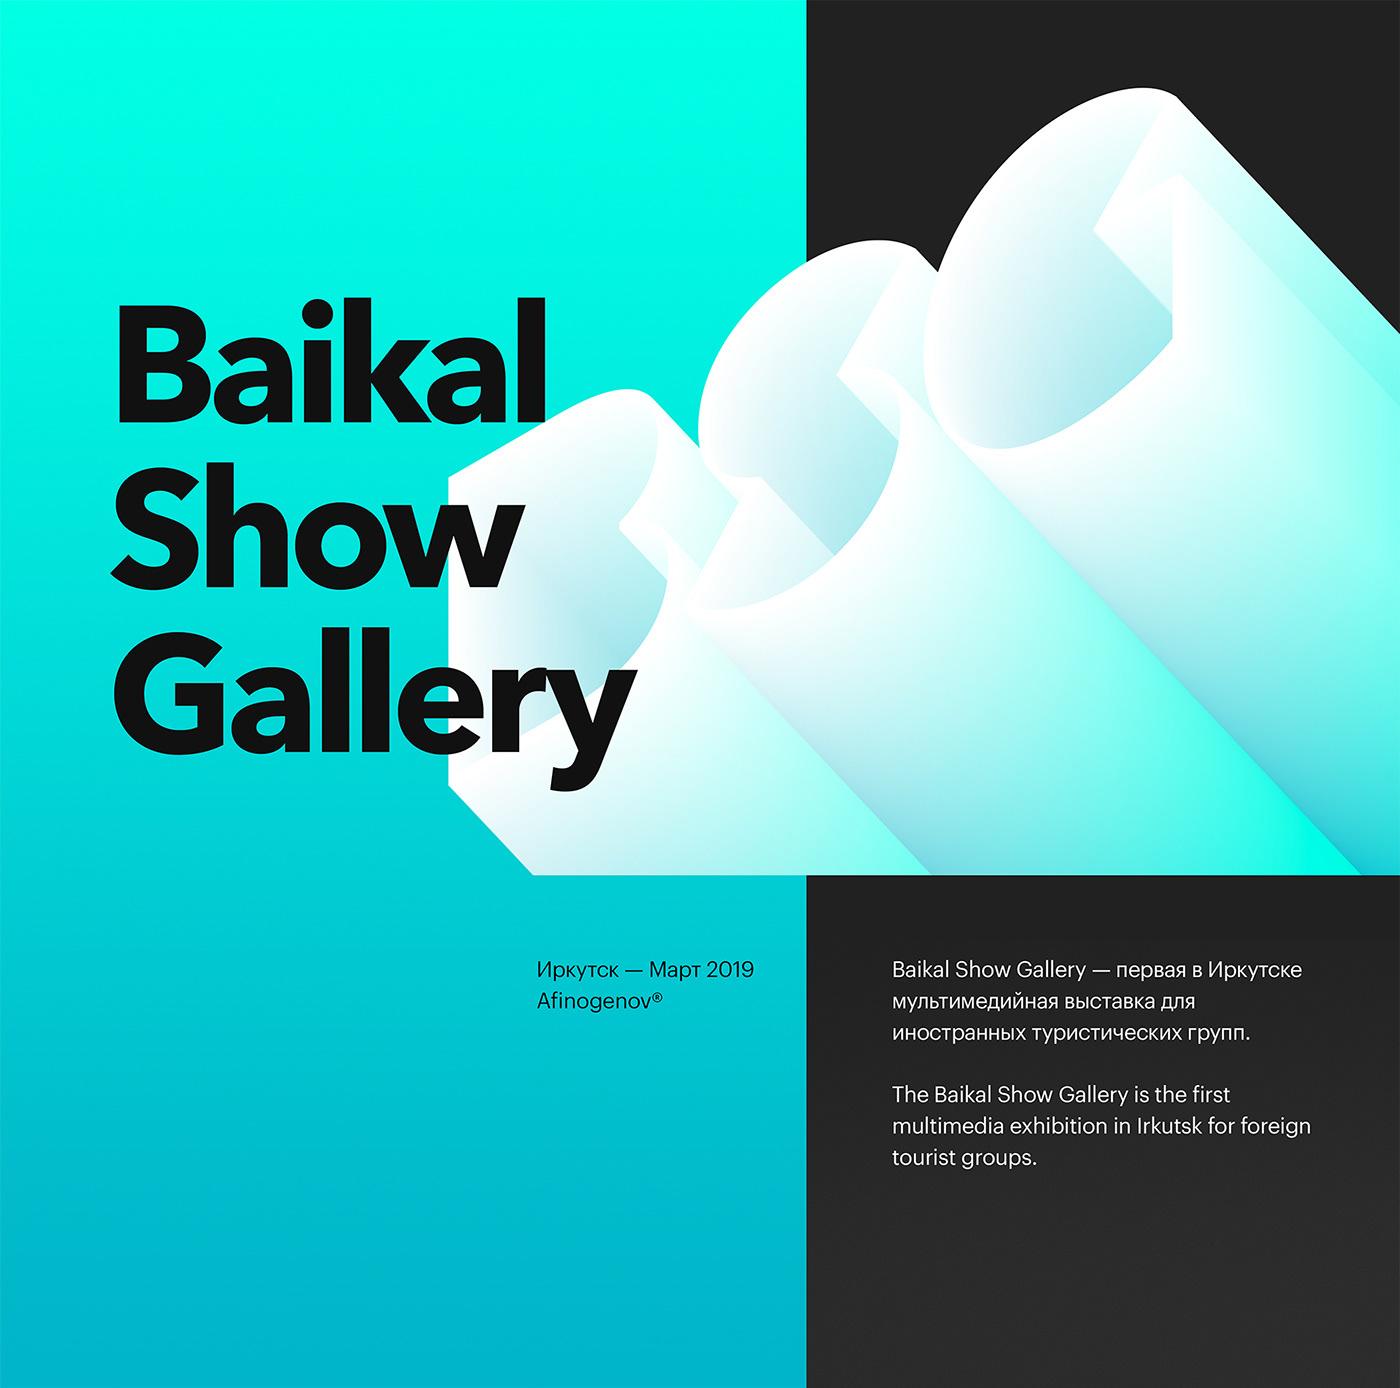 cyan festival Exhibition  gallery baikal Show irkutsk identity branding  inspire